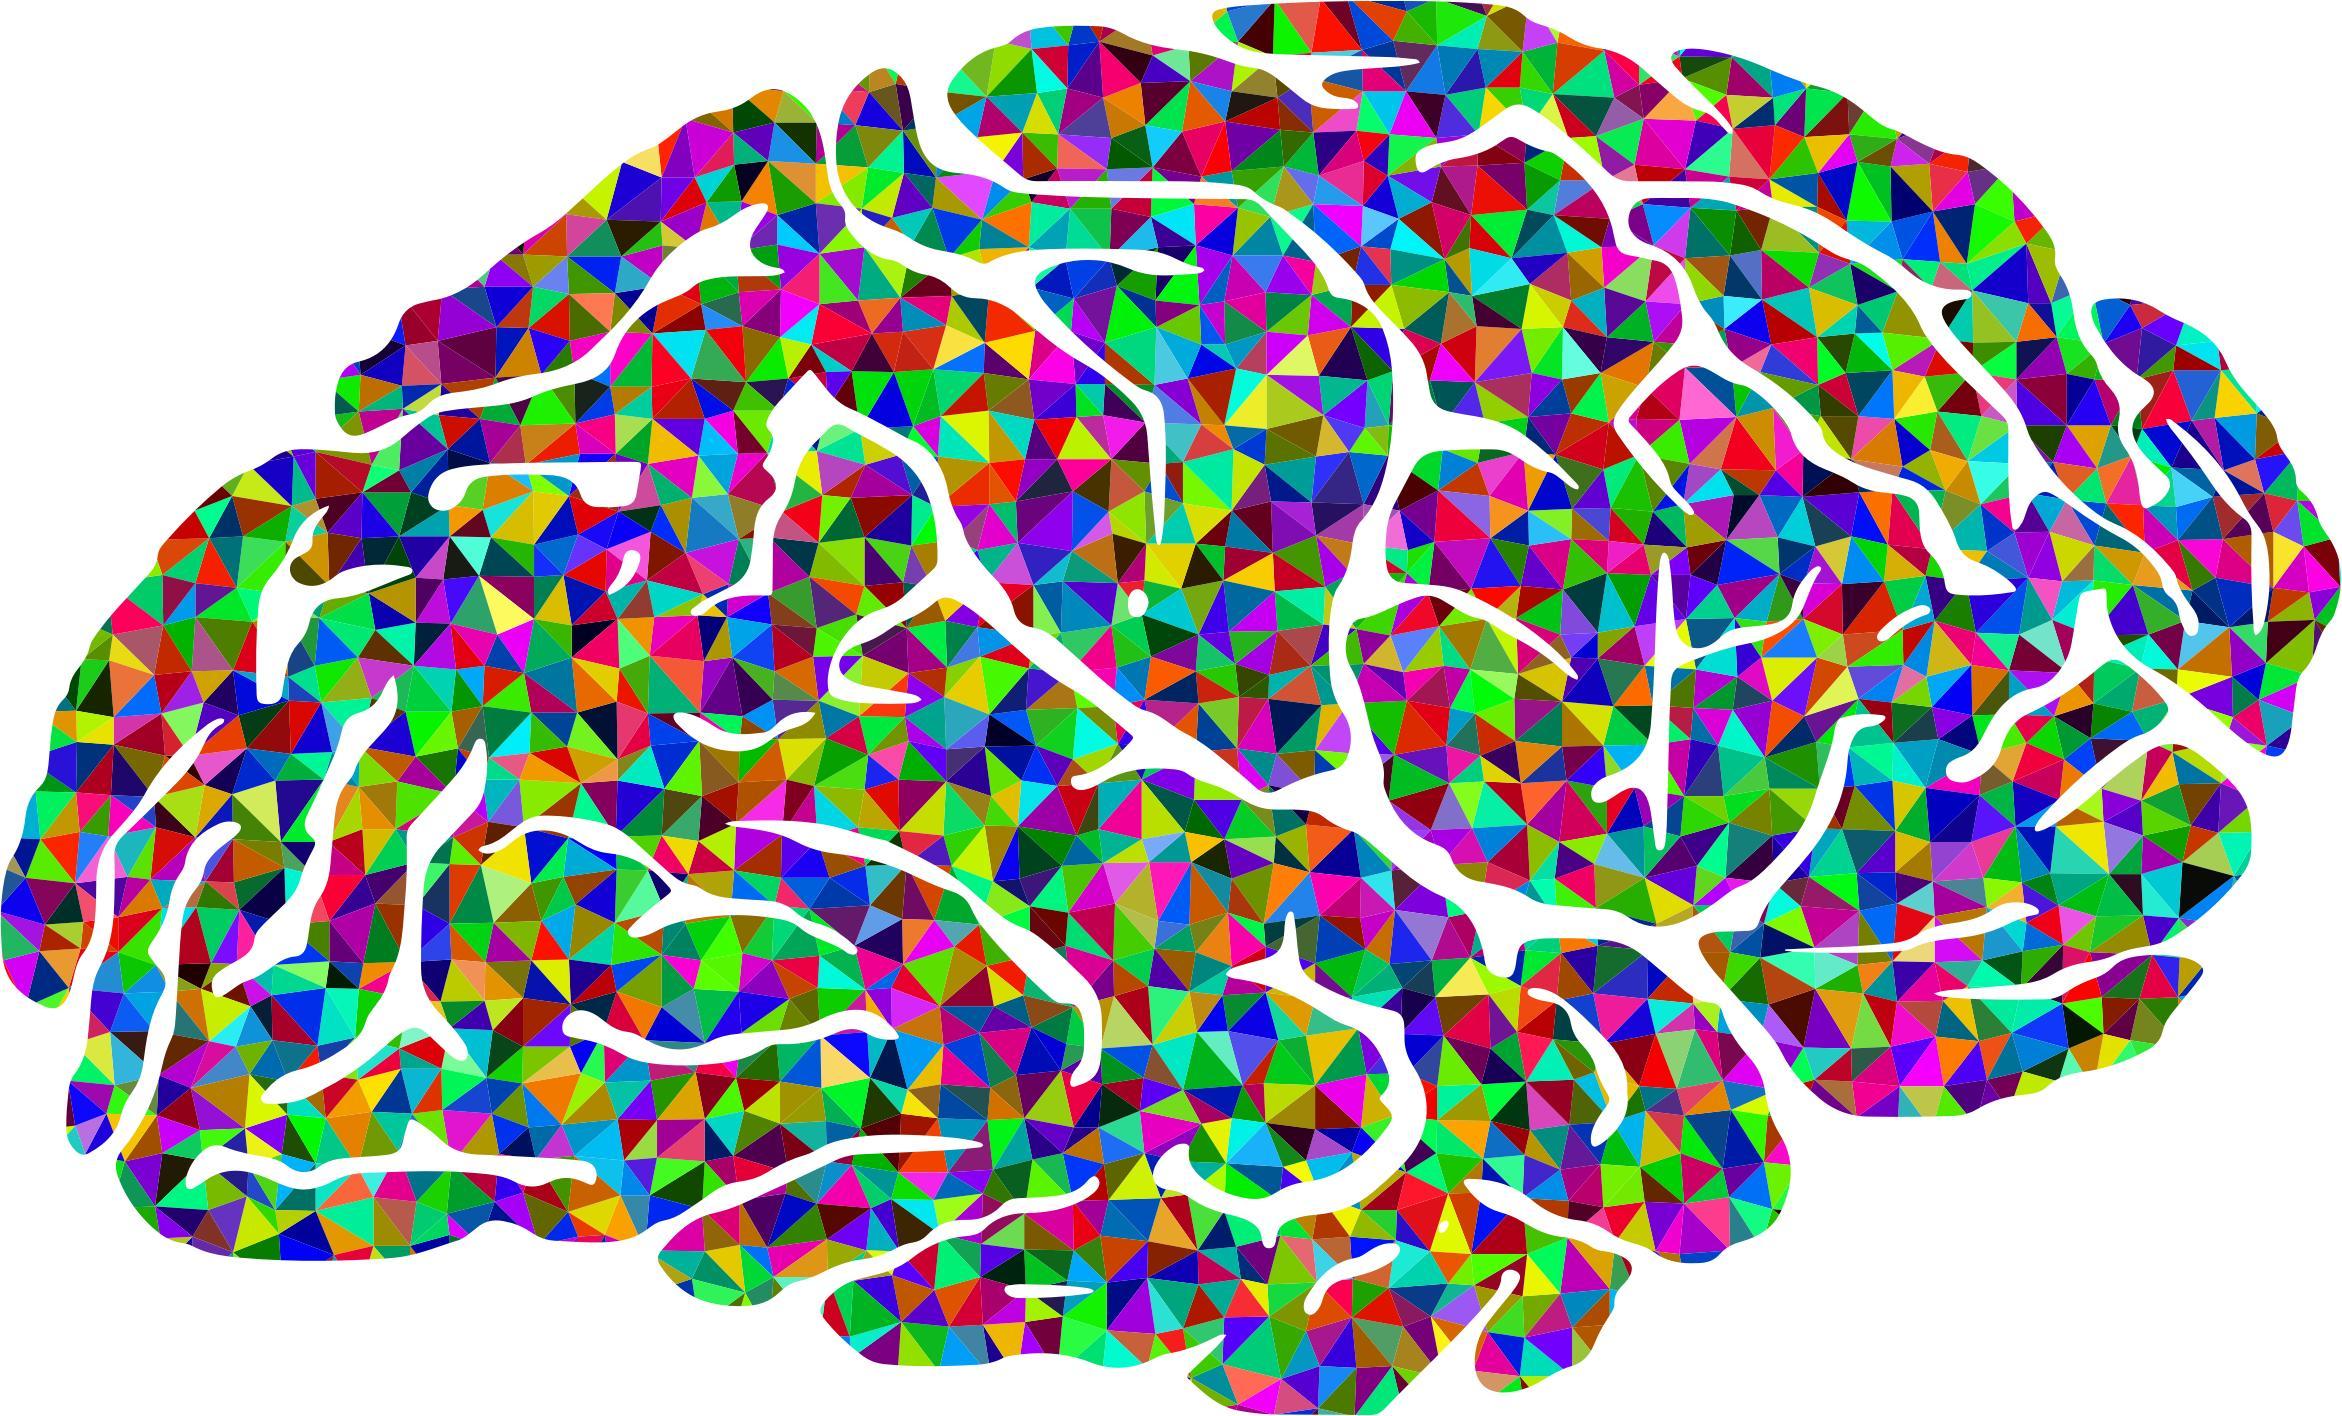 2342x1416 Free Brain Icons Png, Bra N Images